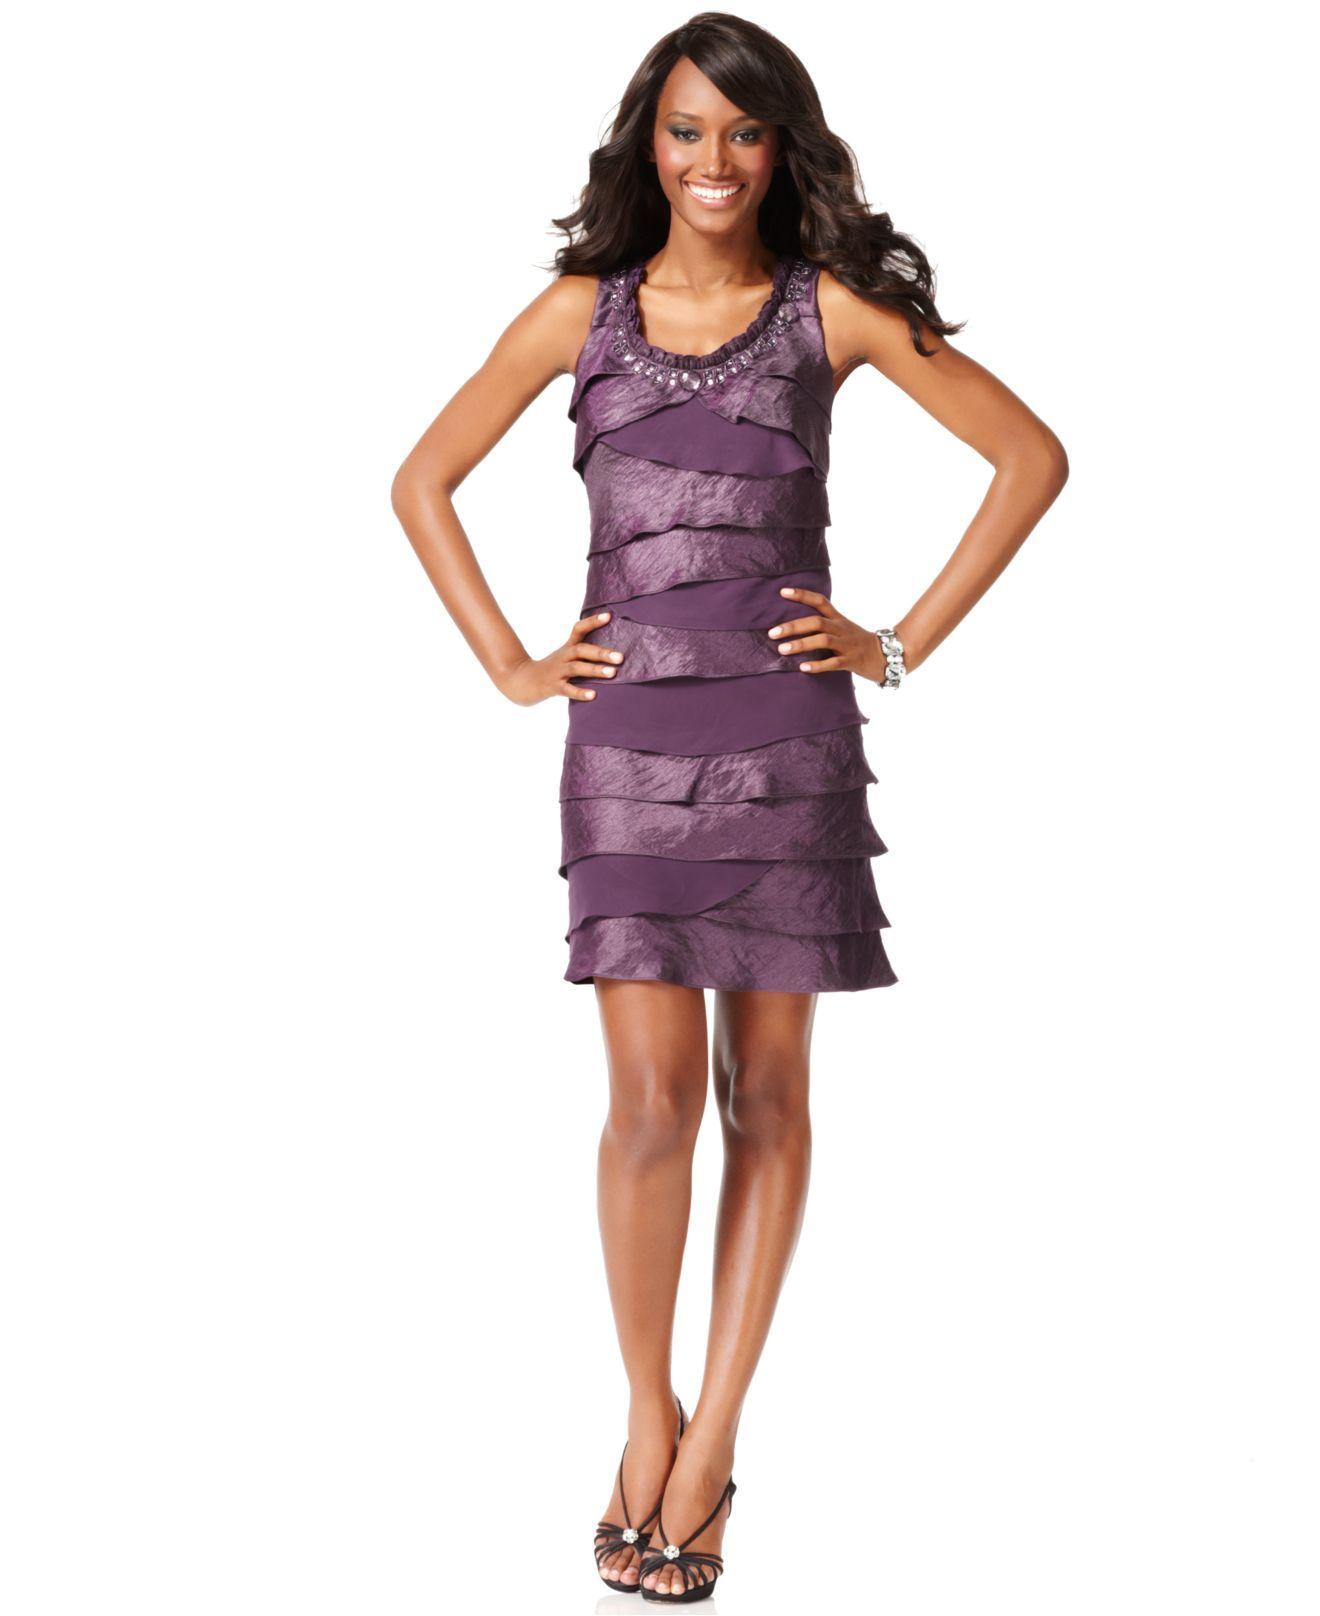 Sl sl fashion dresses - Sl Fashions Dress Sleeveless Asymmetrical Pleated Cocktail Dress Womens Wedding Dresses